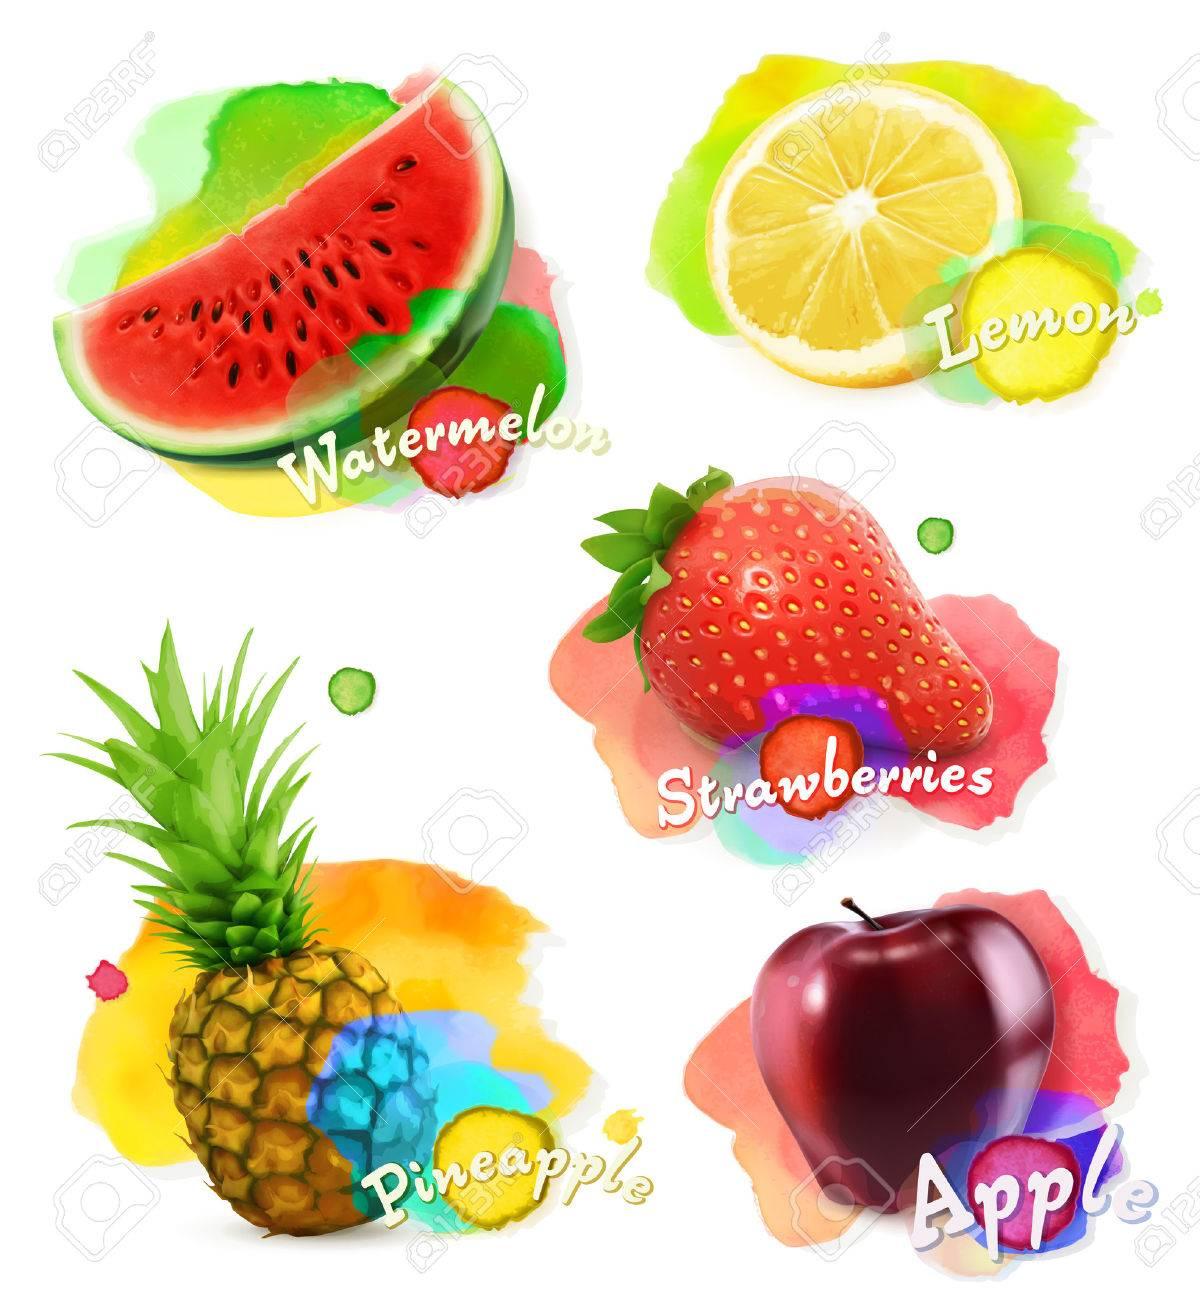 Fruit and berries watercolor, vector illustration set Stock Vector - 41234186